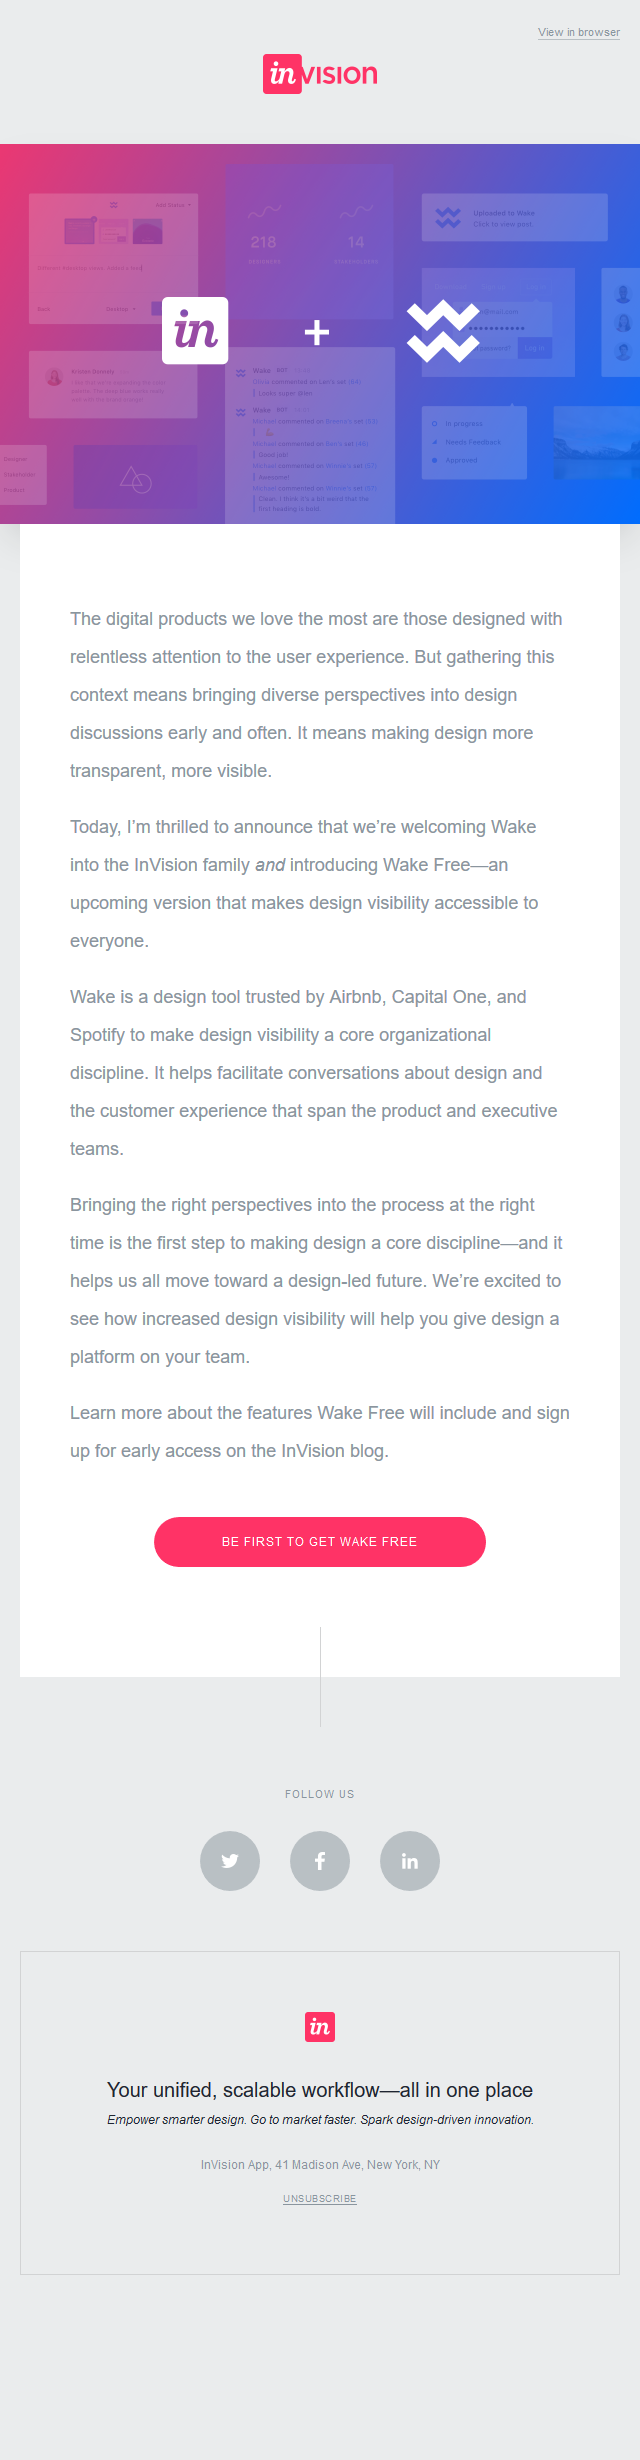 Wake + InVision—bringing design visibility to more teams